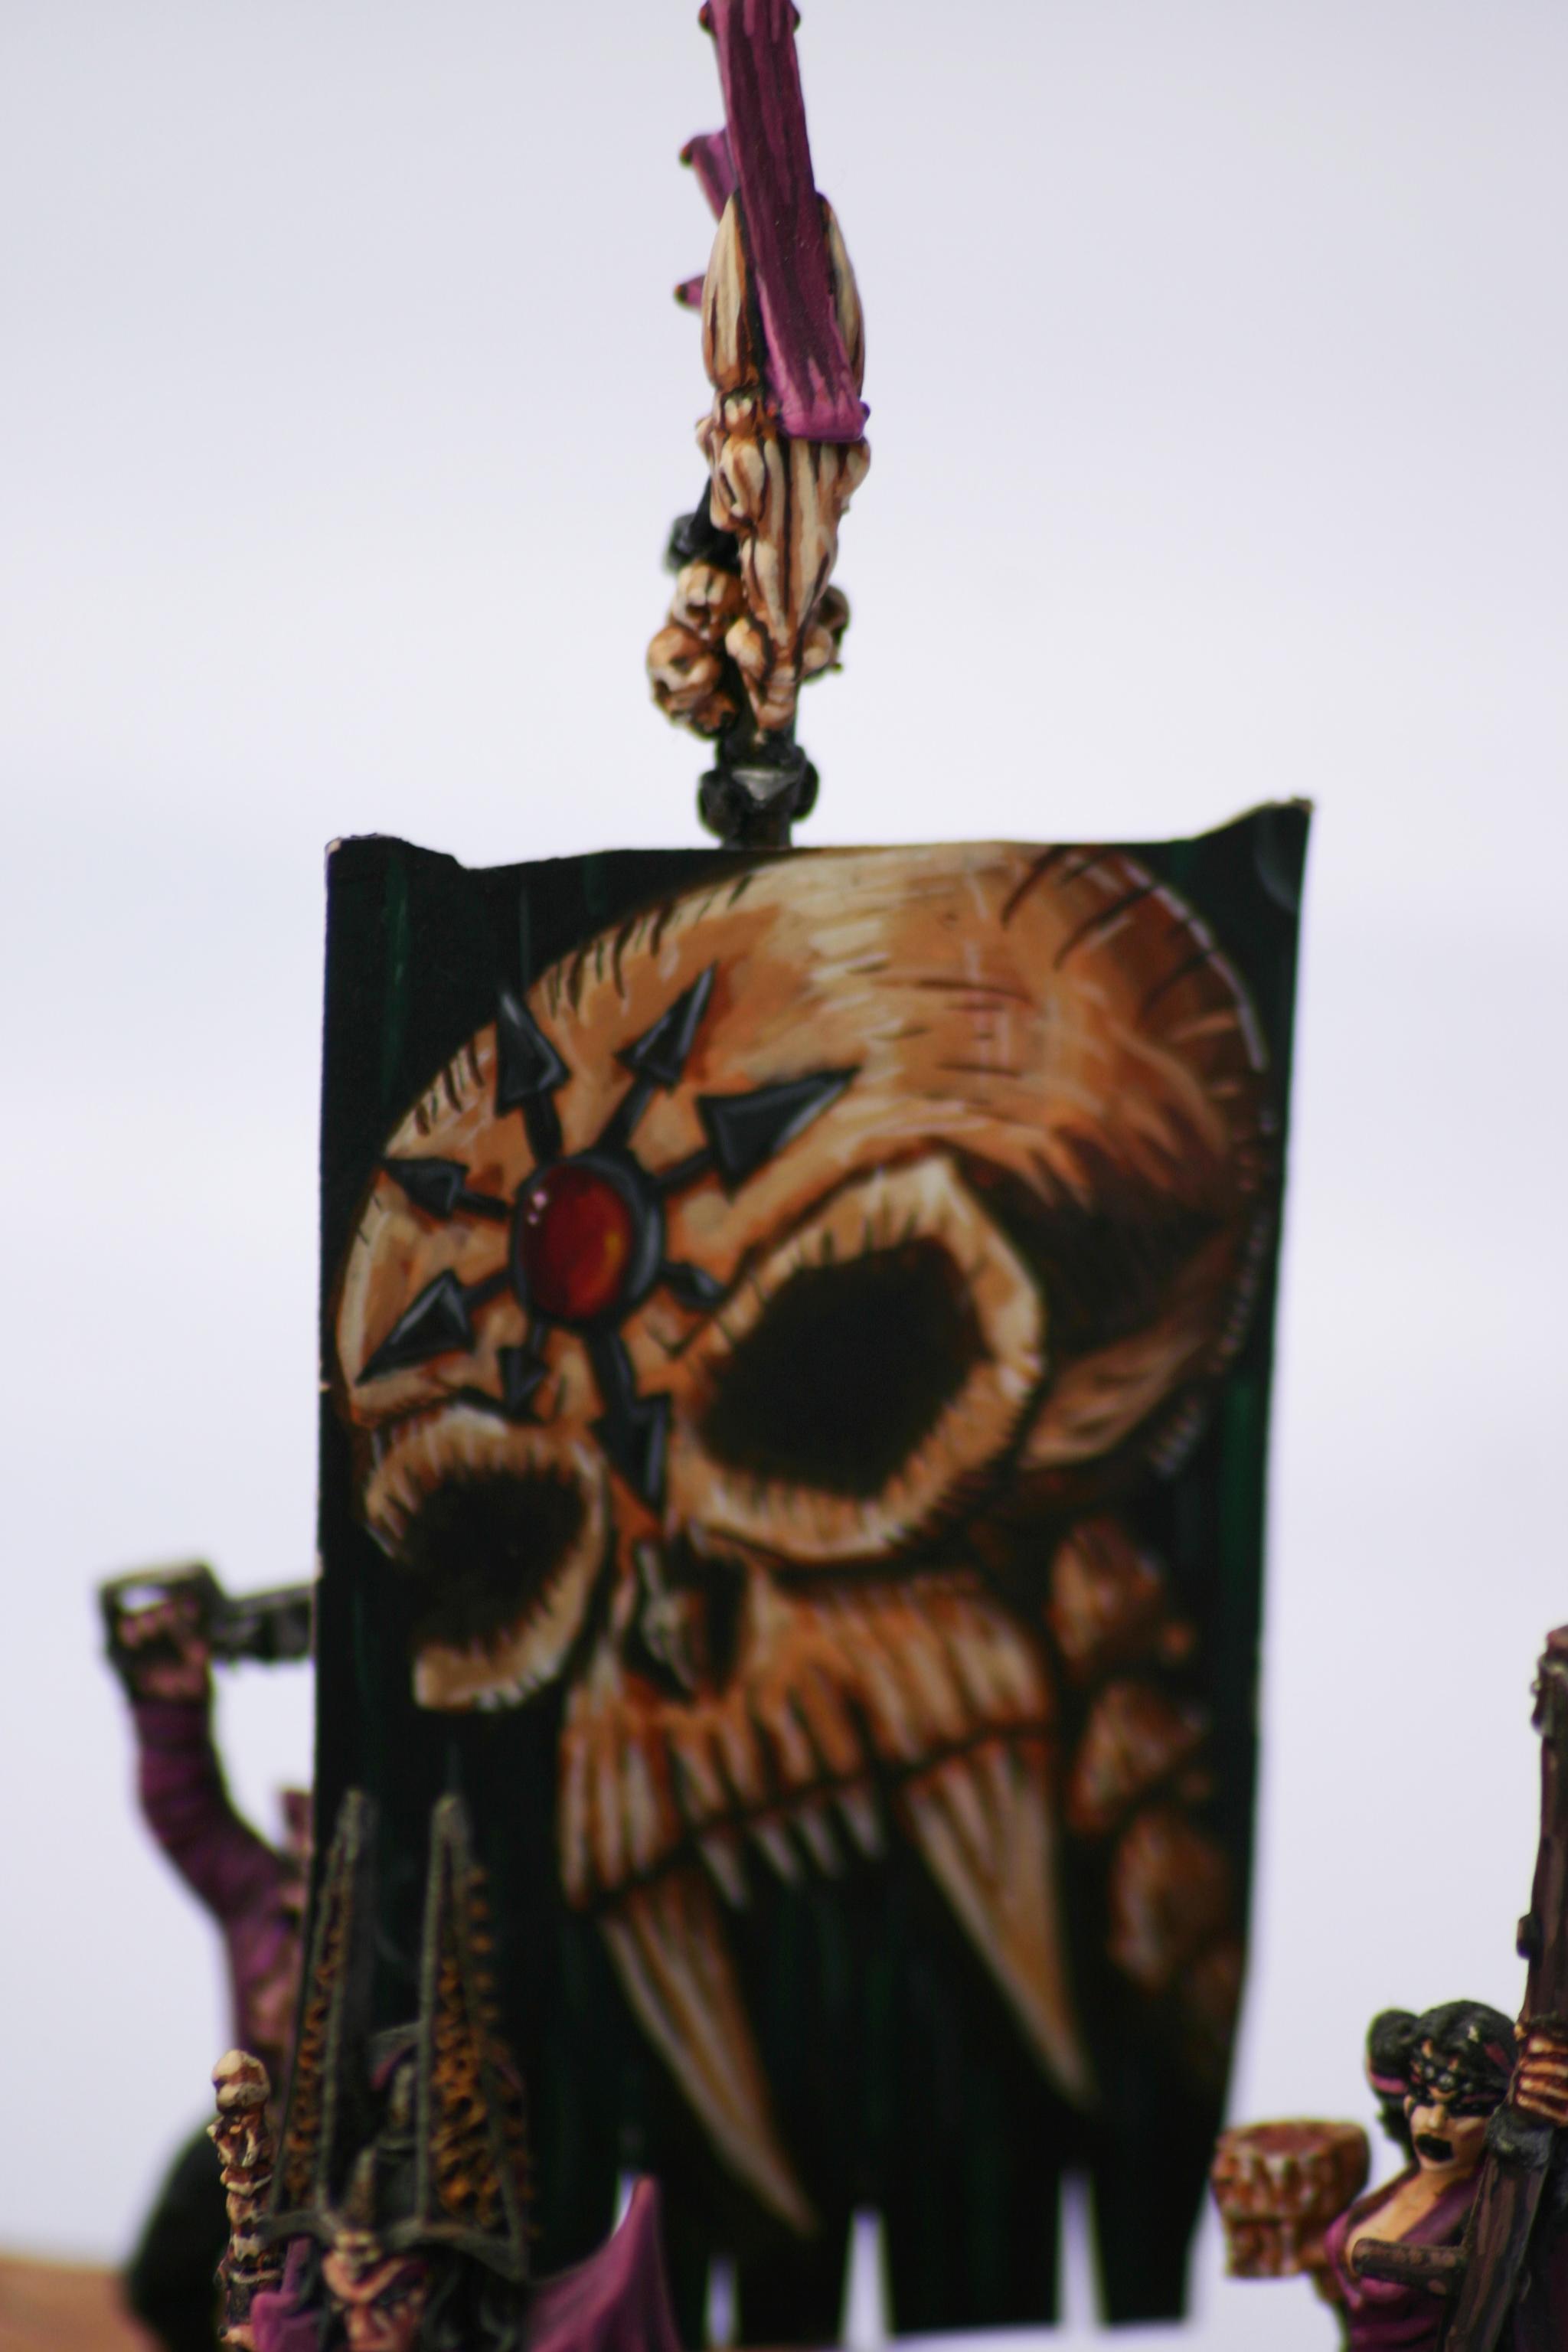 Command, Golden Deamon Finalist, Vampire Counts, Warhammer Fantasy